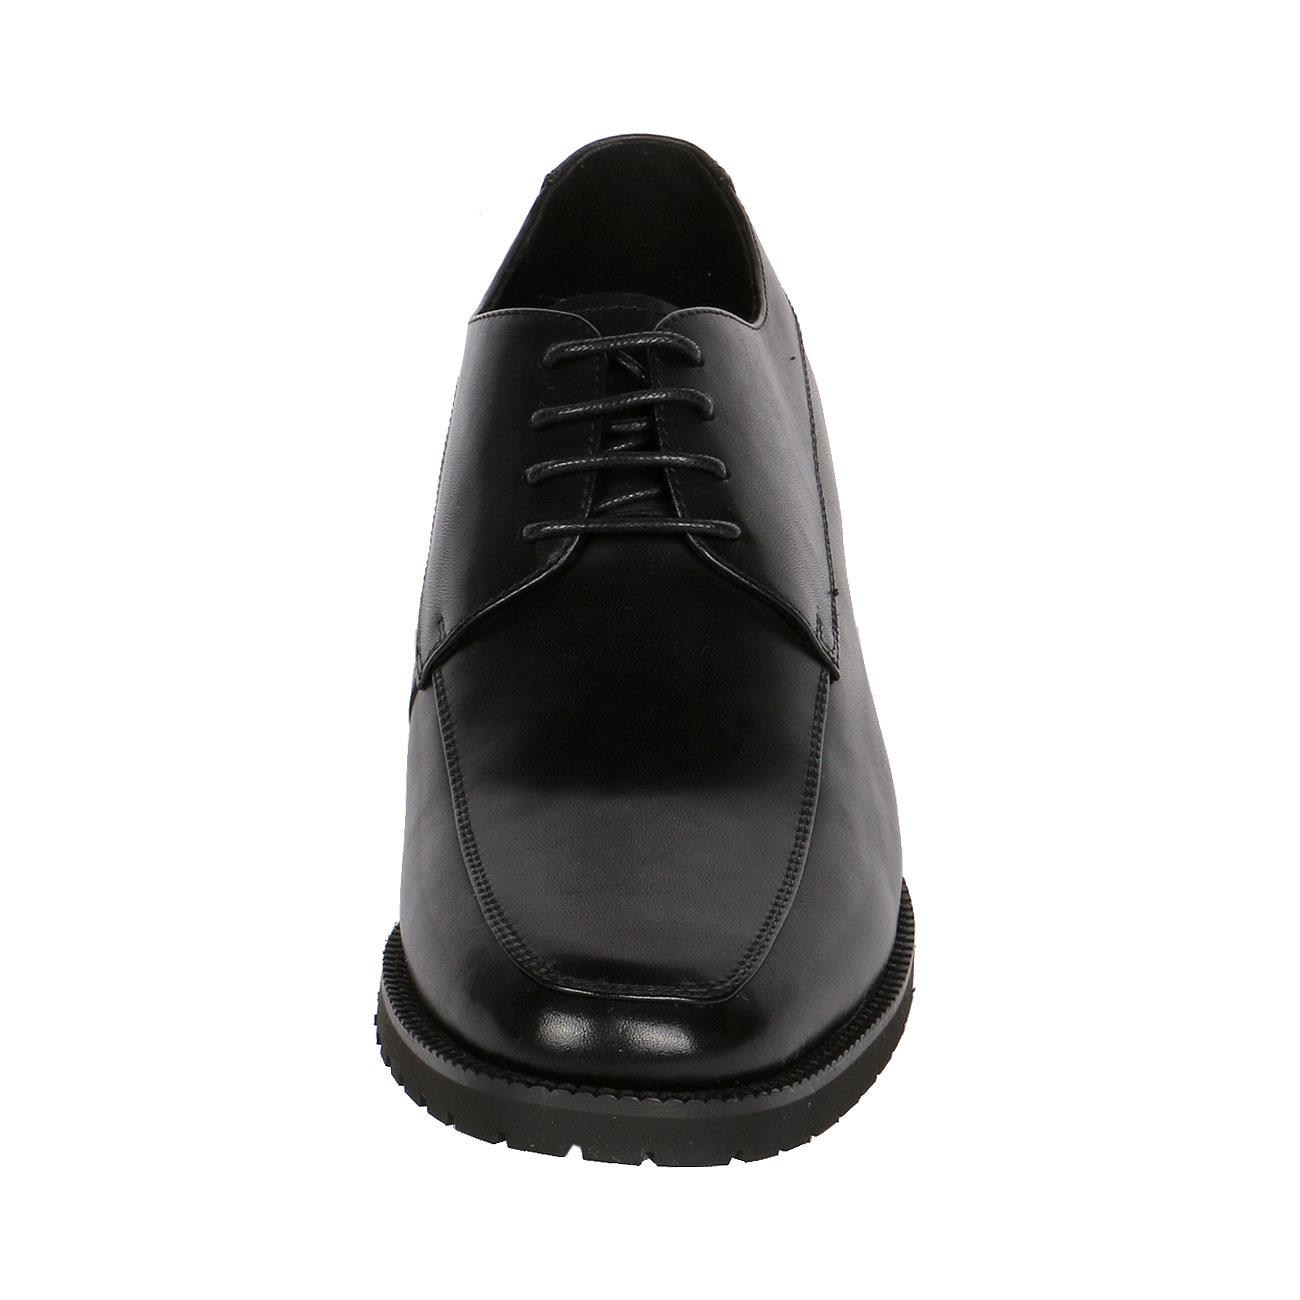 Apron Toe Derby Men Inserted Hidden Shoe Lift 3